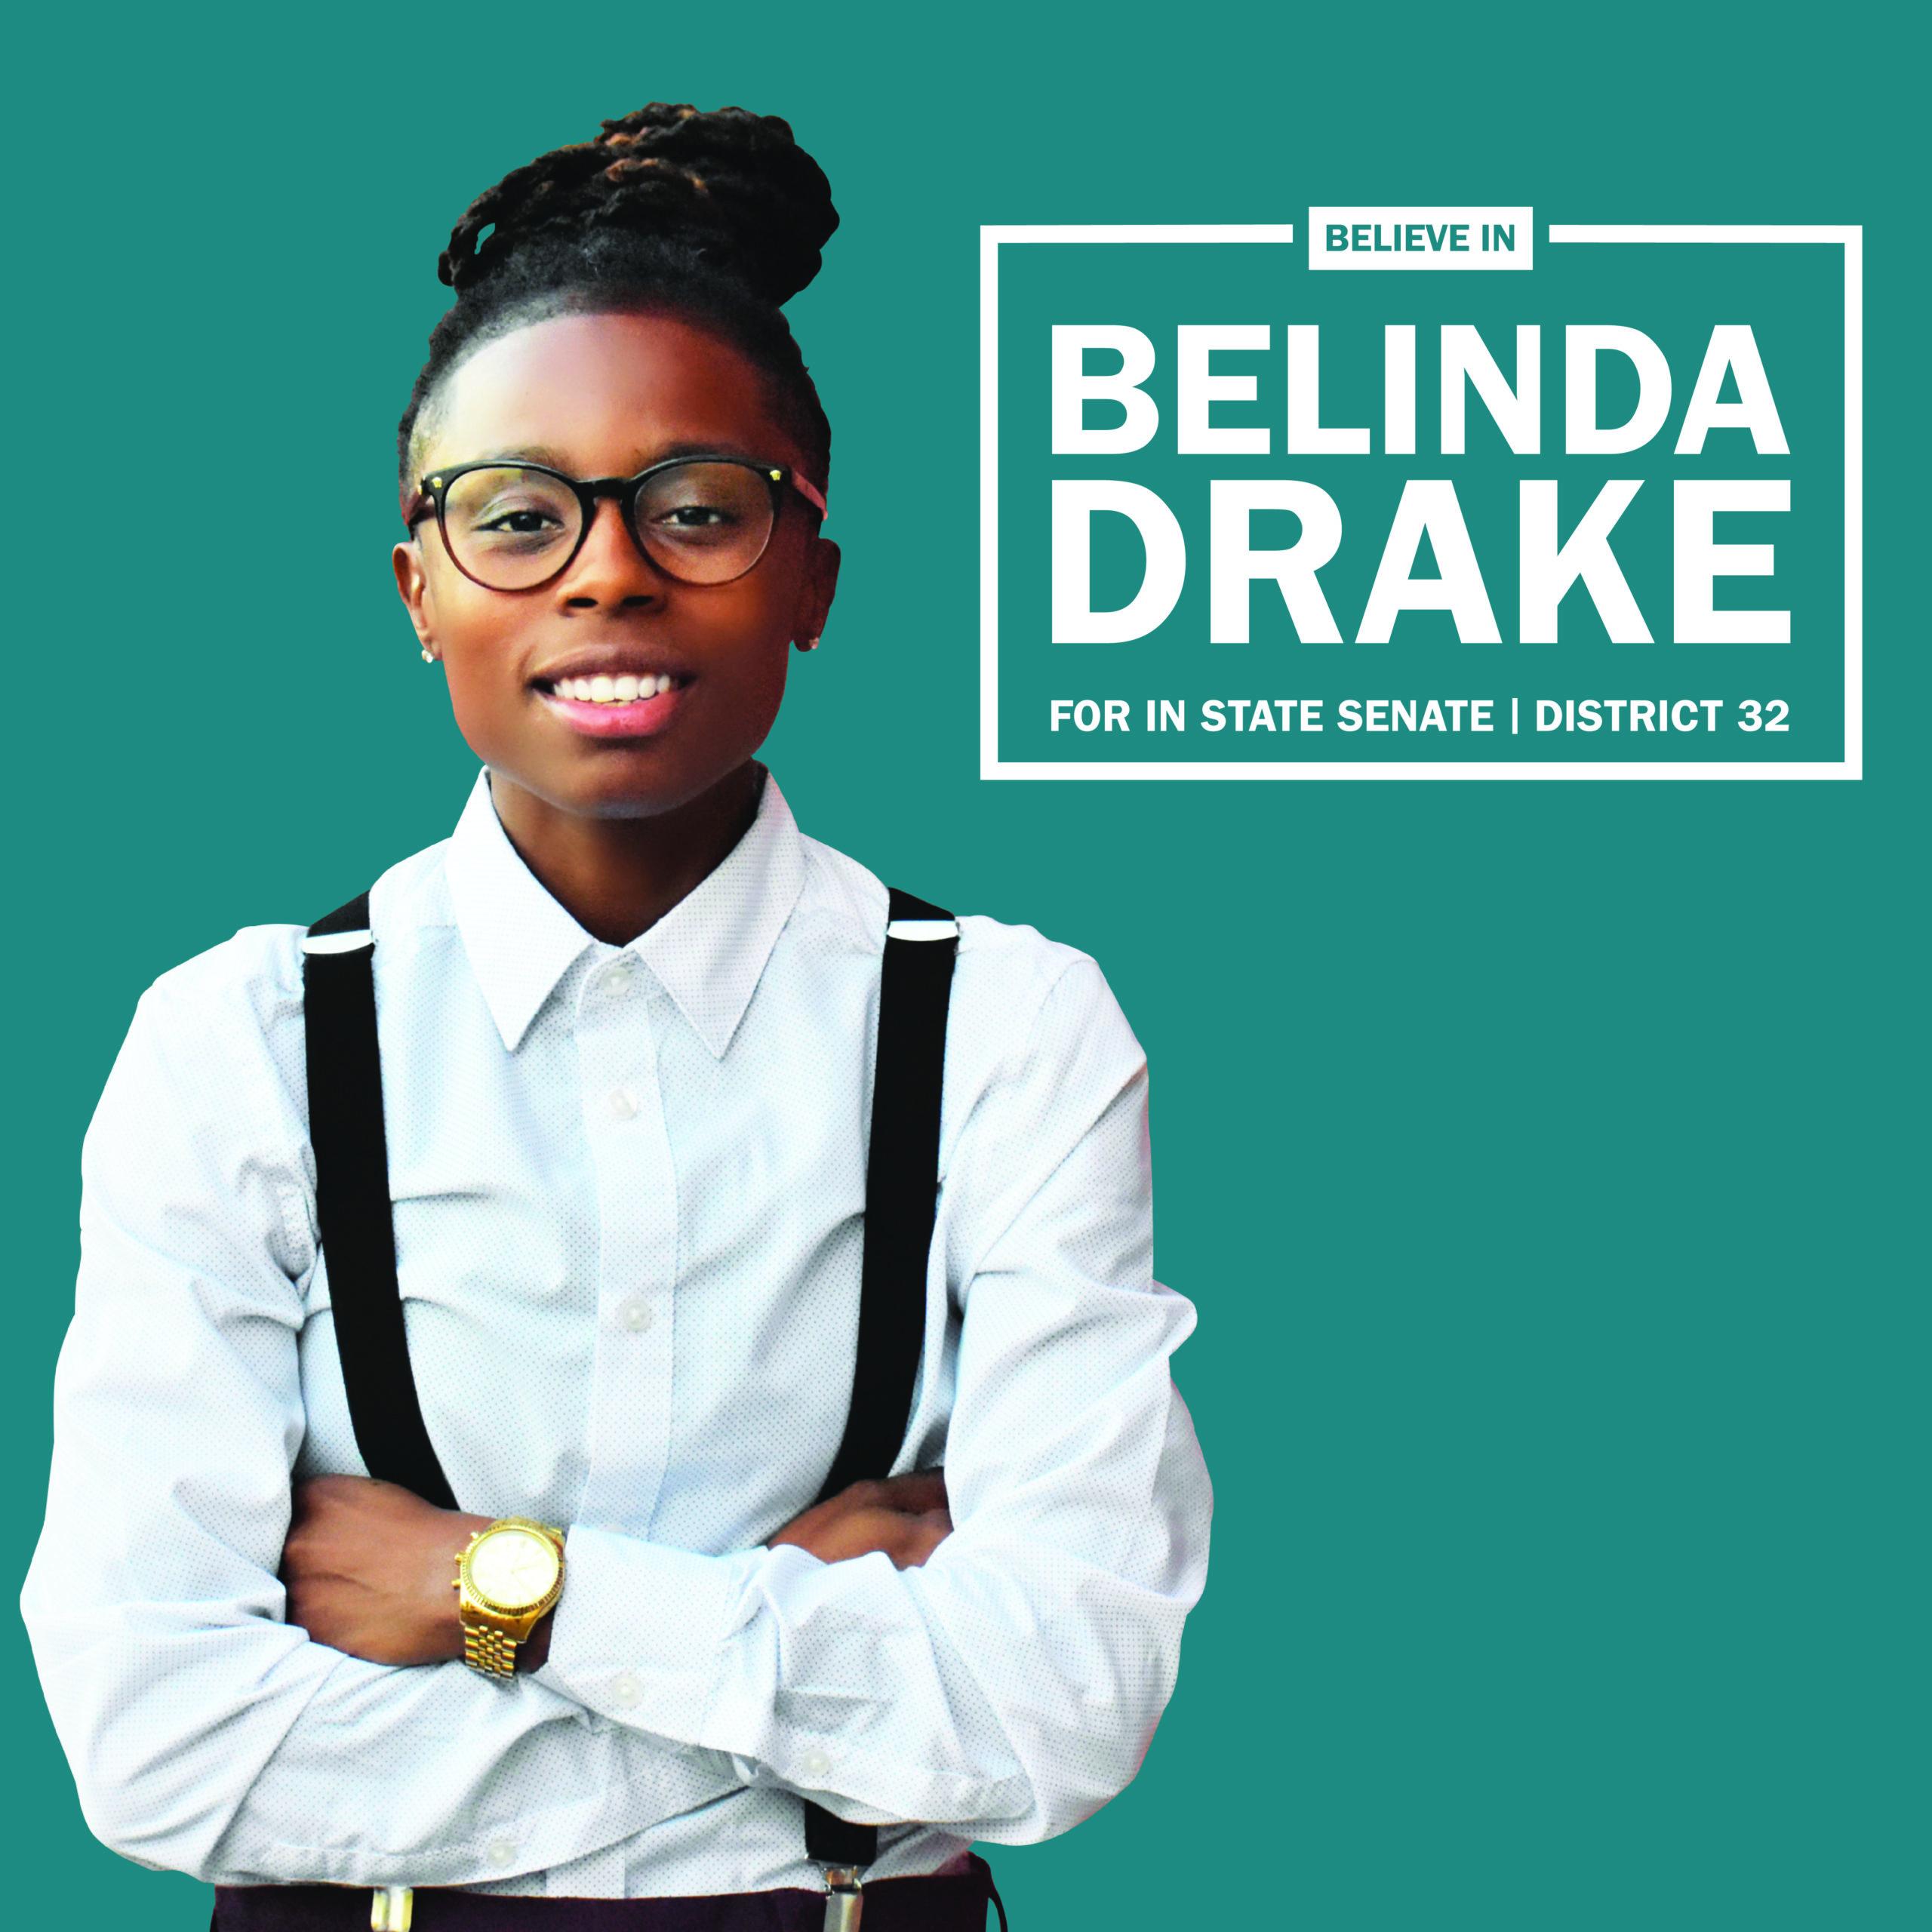 Belinda Drake Files Candidacy for Indiana State Senate